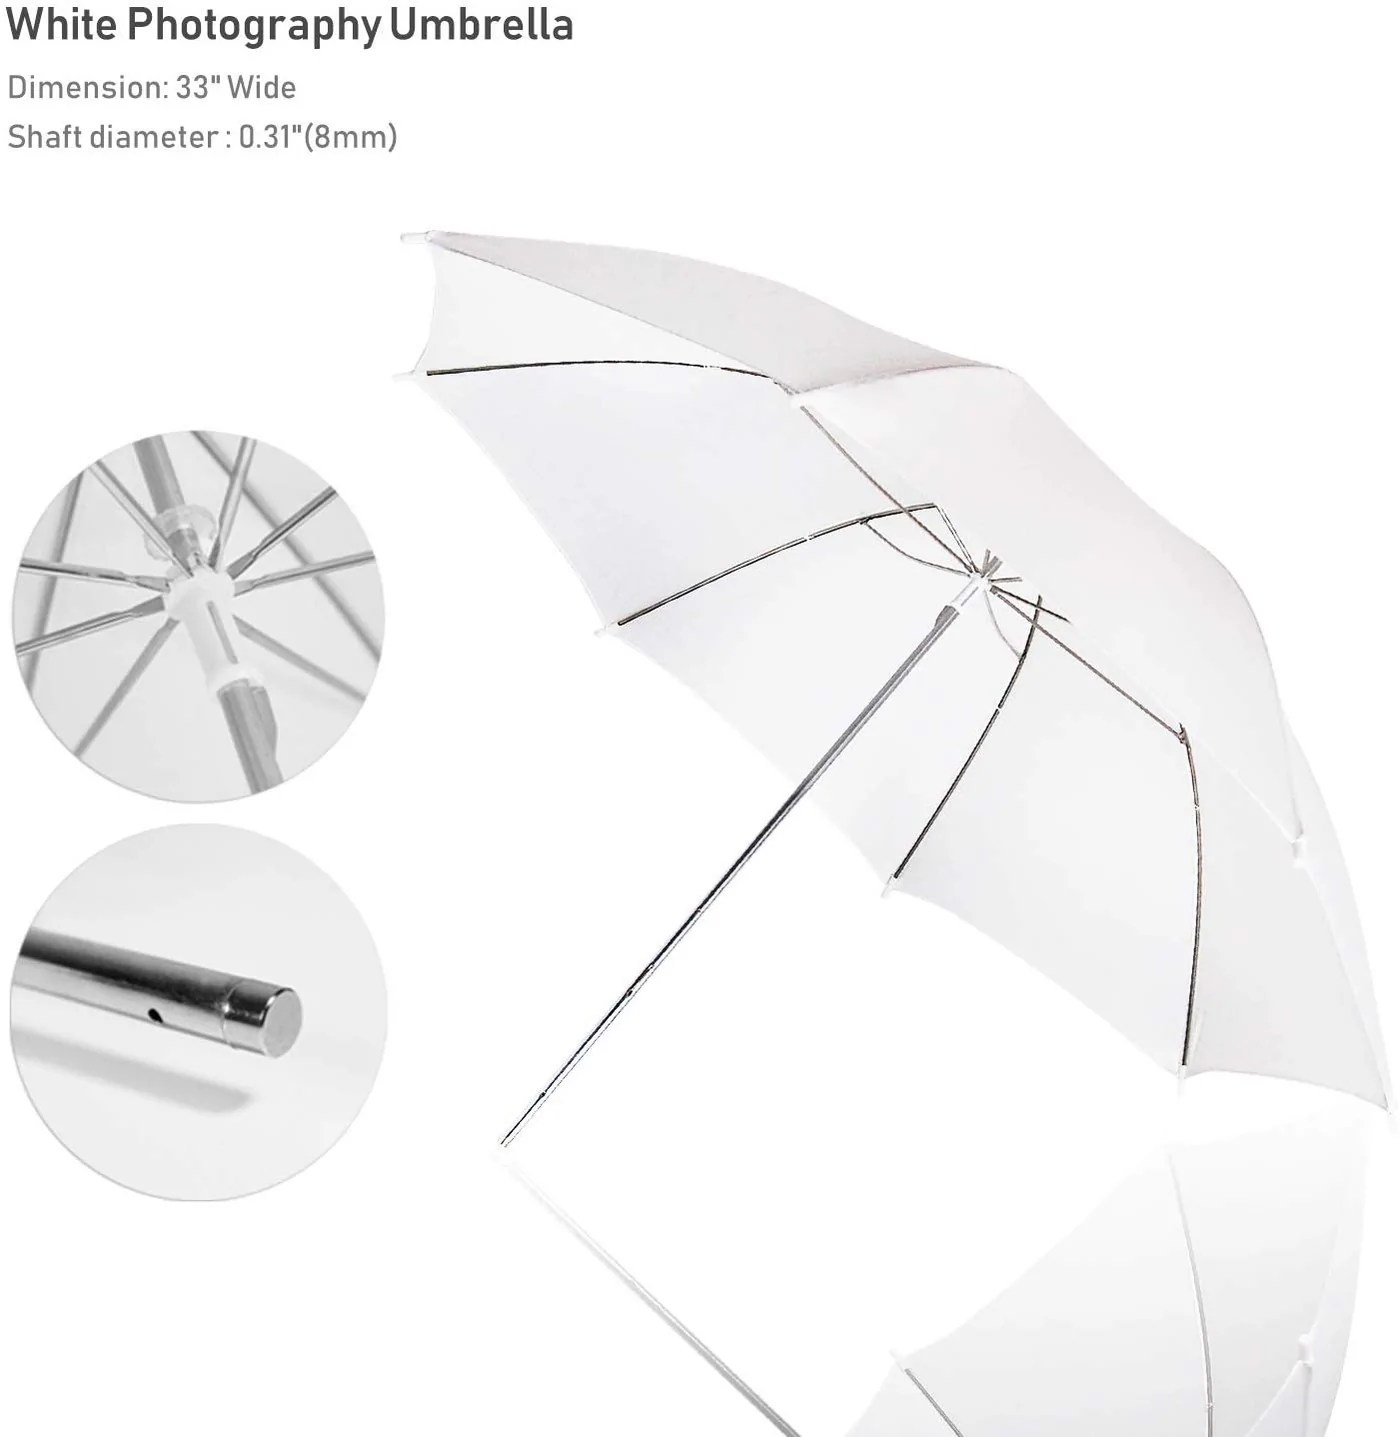 limostudio photography photo portrait studio day light 33 translucent natural lighting white umbrella continuous lighting kit sre1273